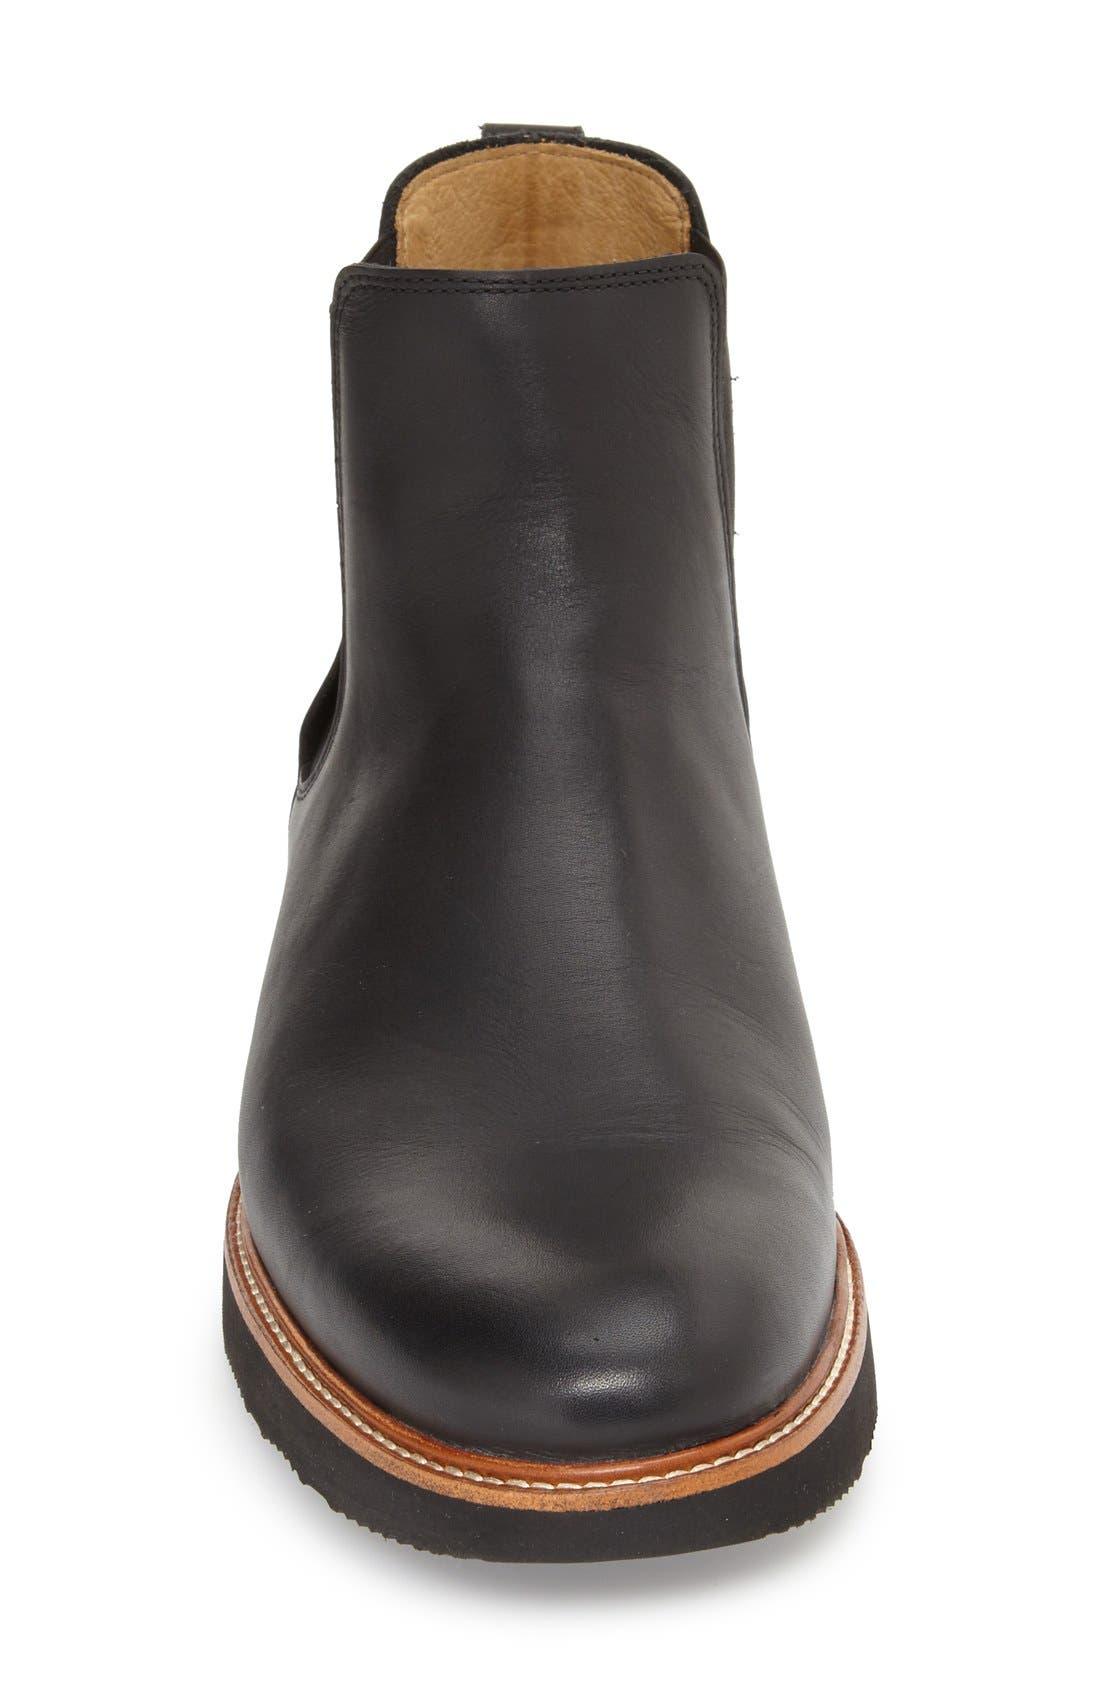 24 Seven Chelsea Boot,                             Alternate thumbnail 3, color,                             Black